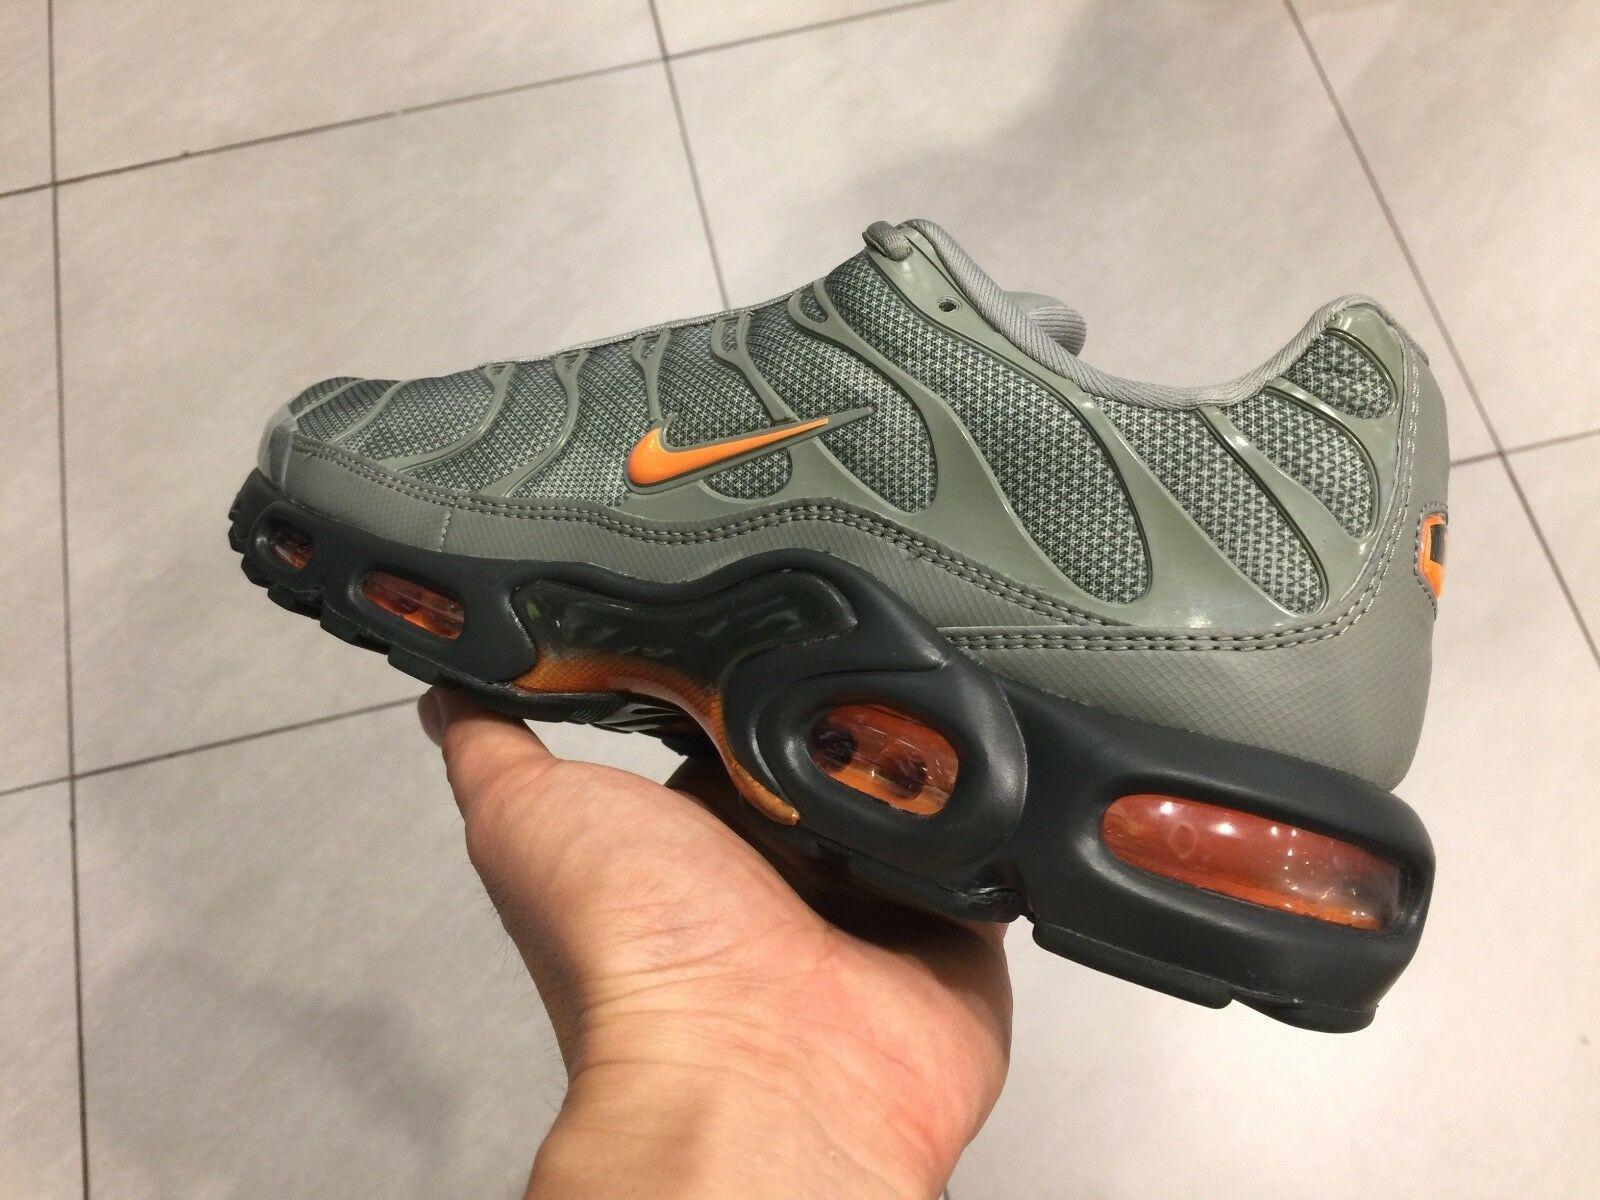 Nike air max 90 95 95 95 1 plus in allen schwarz - grn og  olive gray rot - orange bf2f27